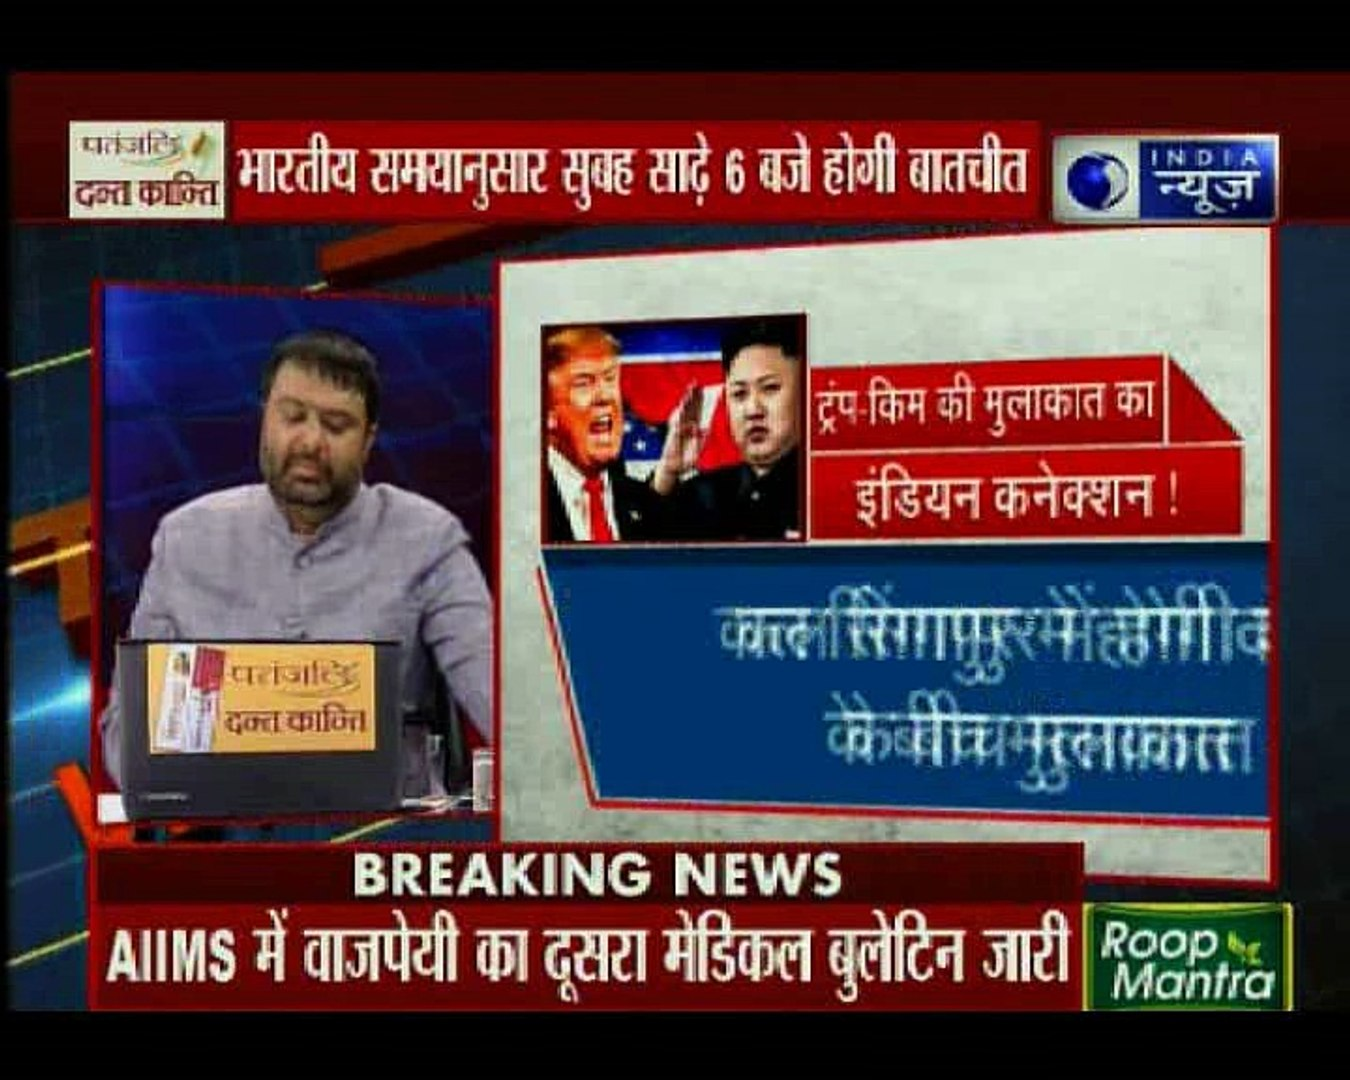 11 June Top News By Deepak Chaurasia | India News | Today News